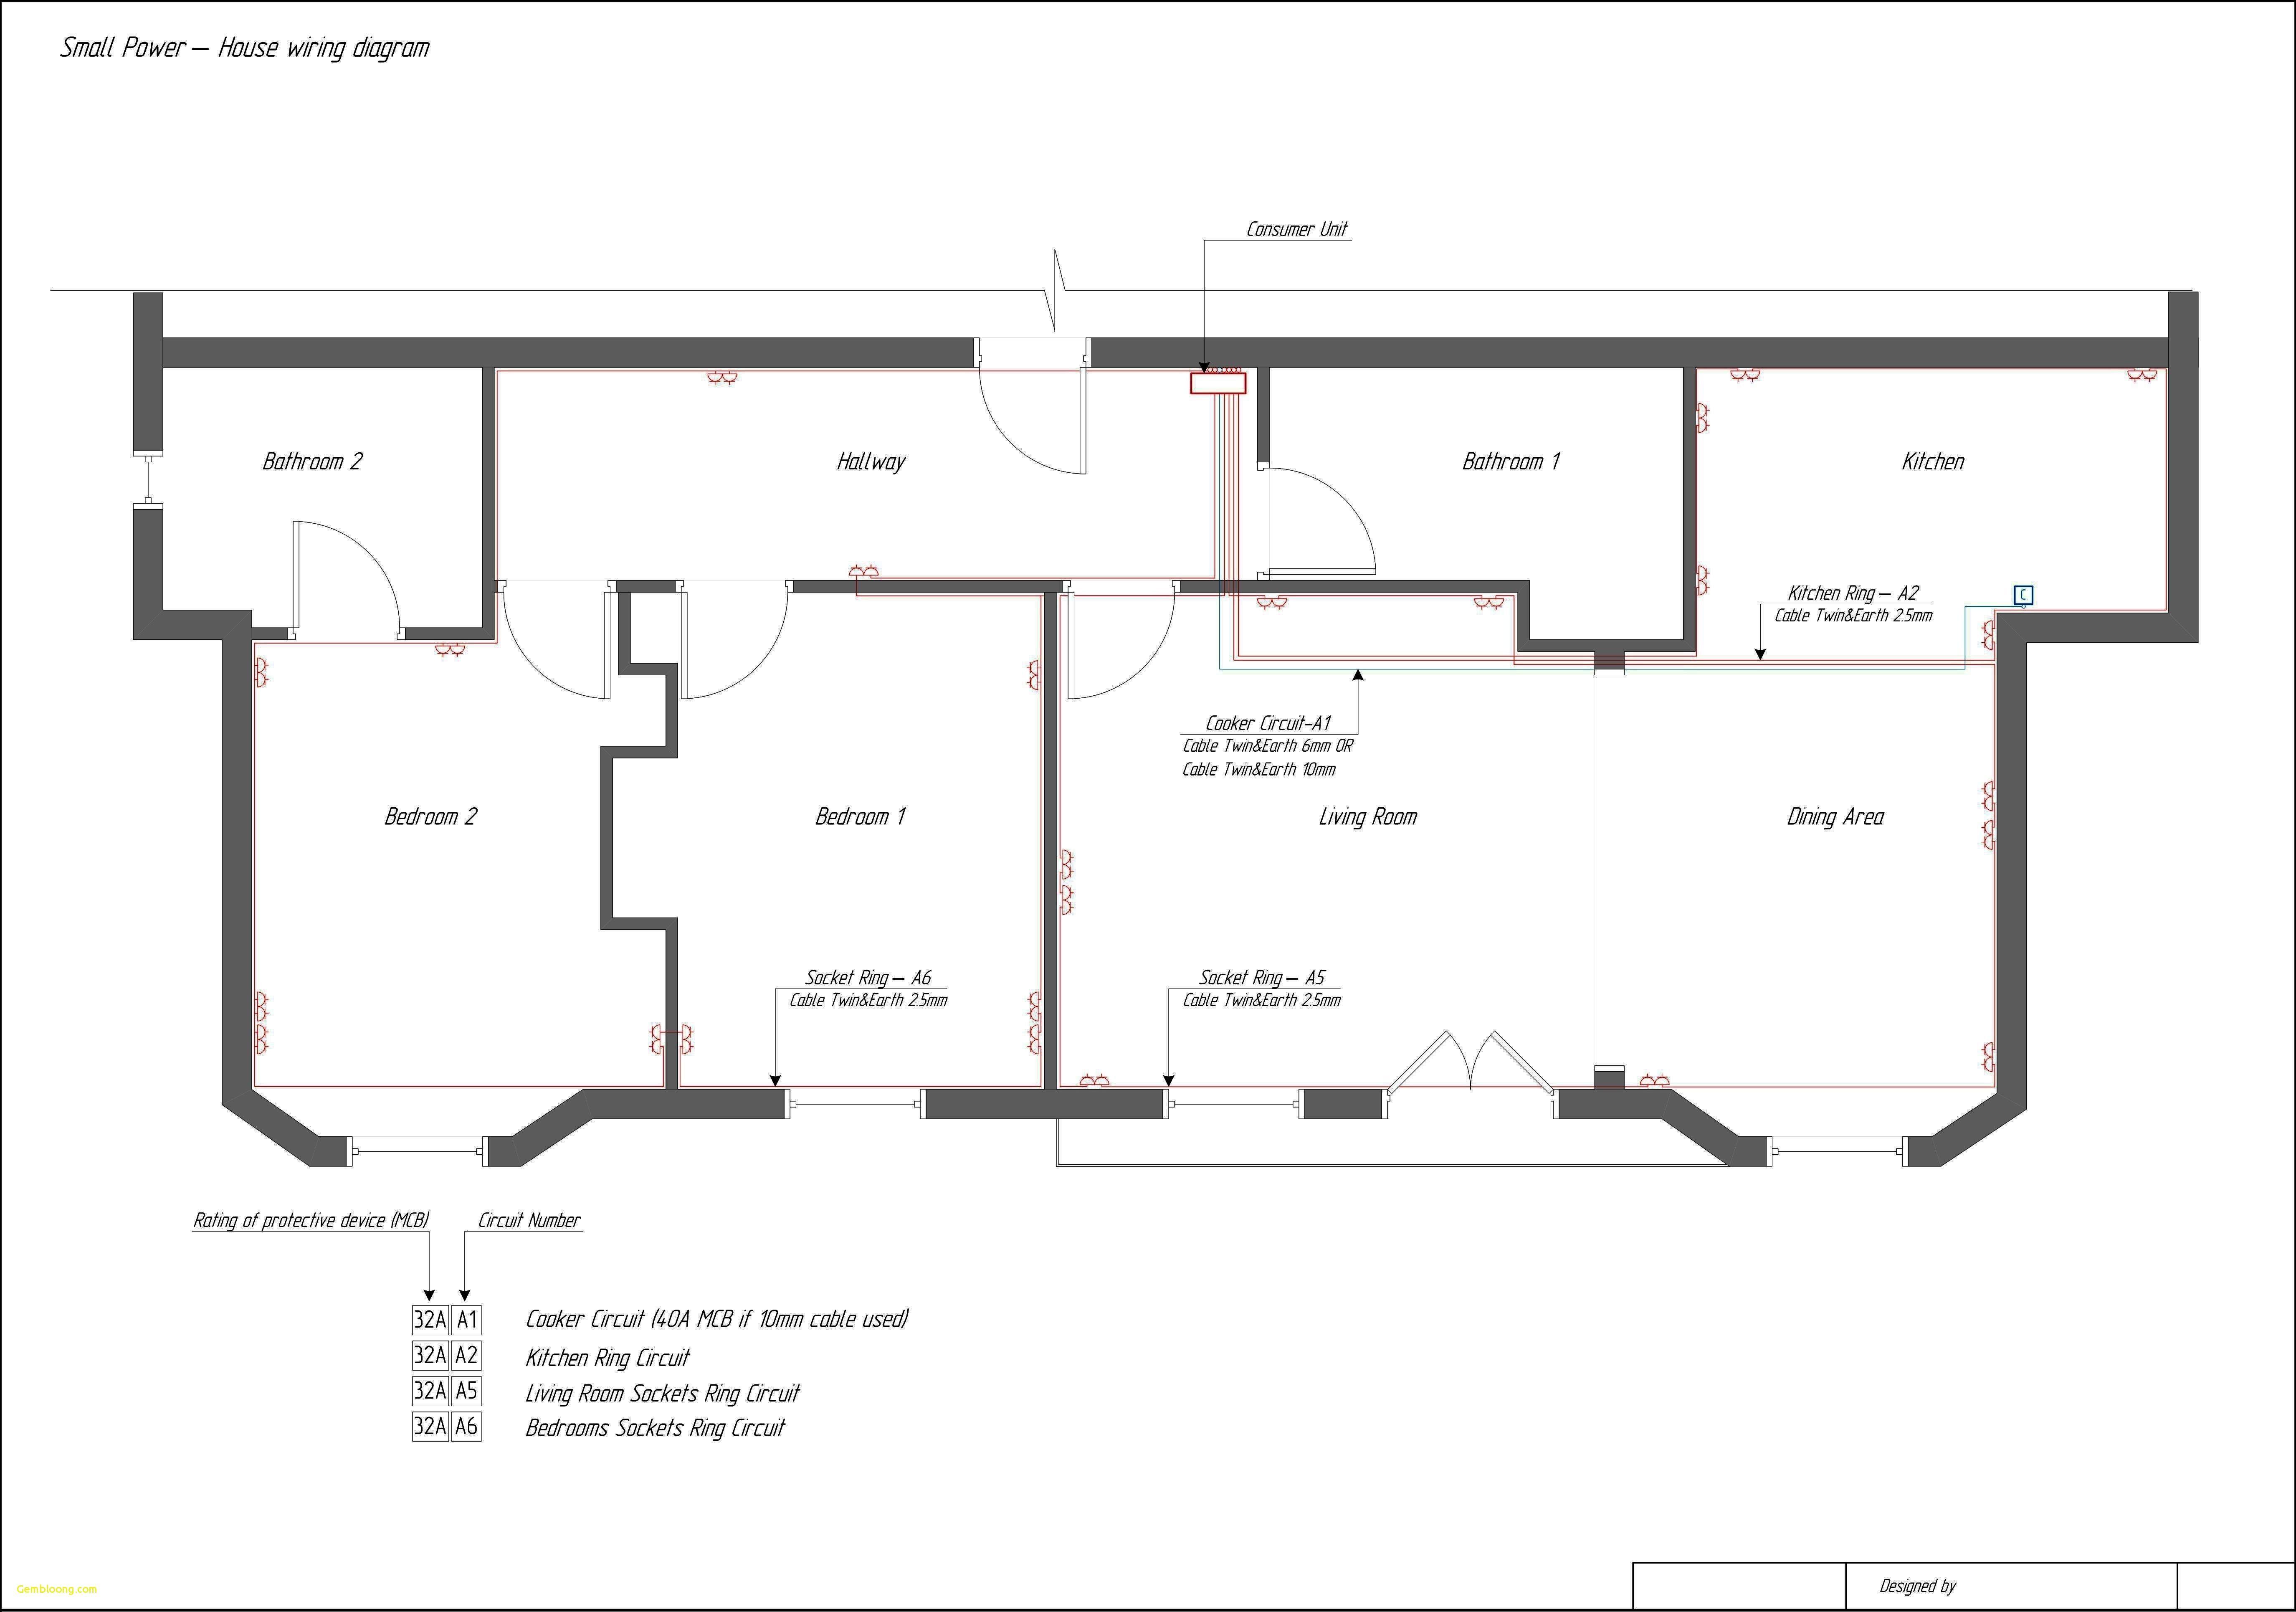 New Light Switch Symbol Floor Plan Diagram Wiringdiagram